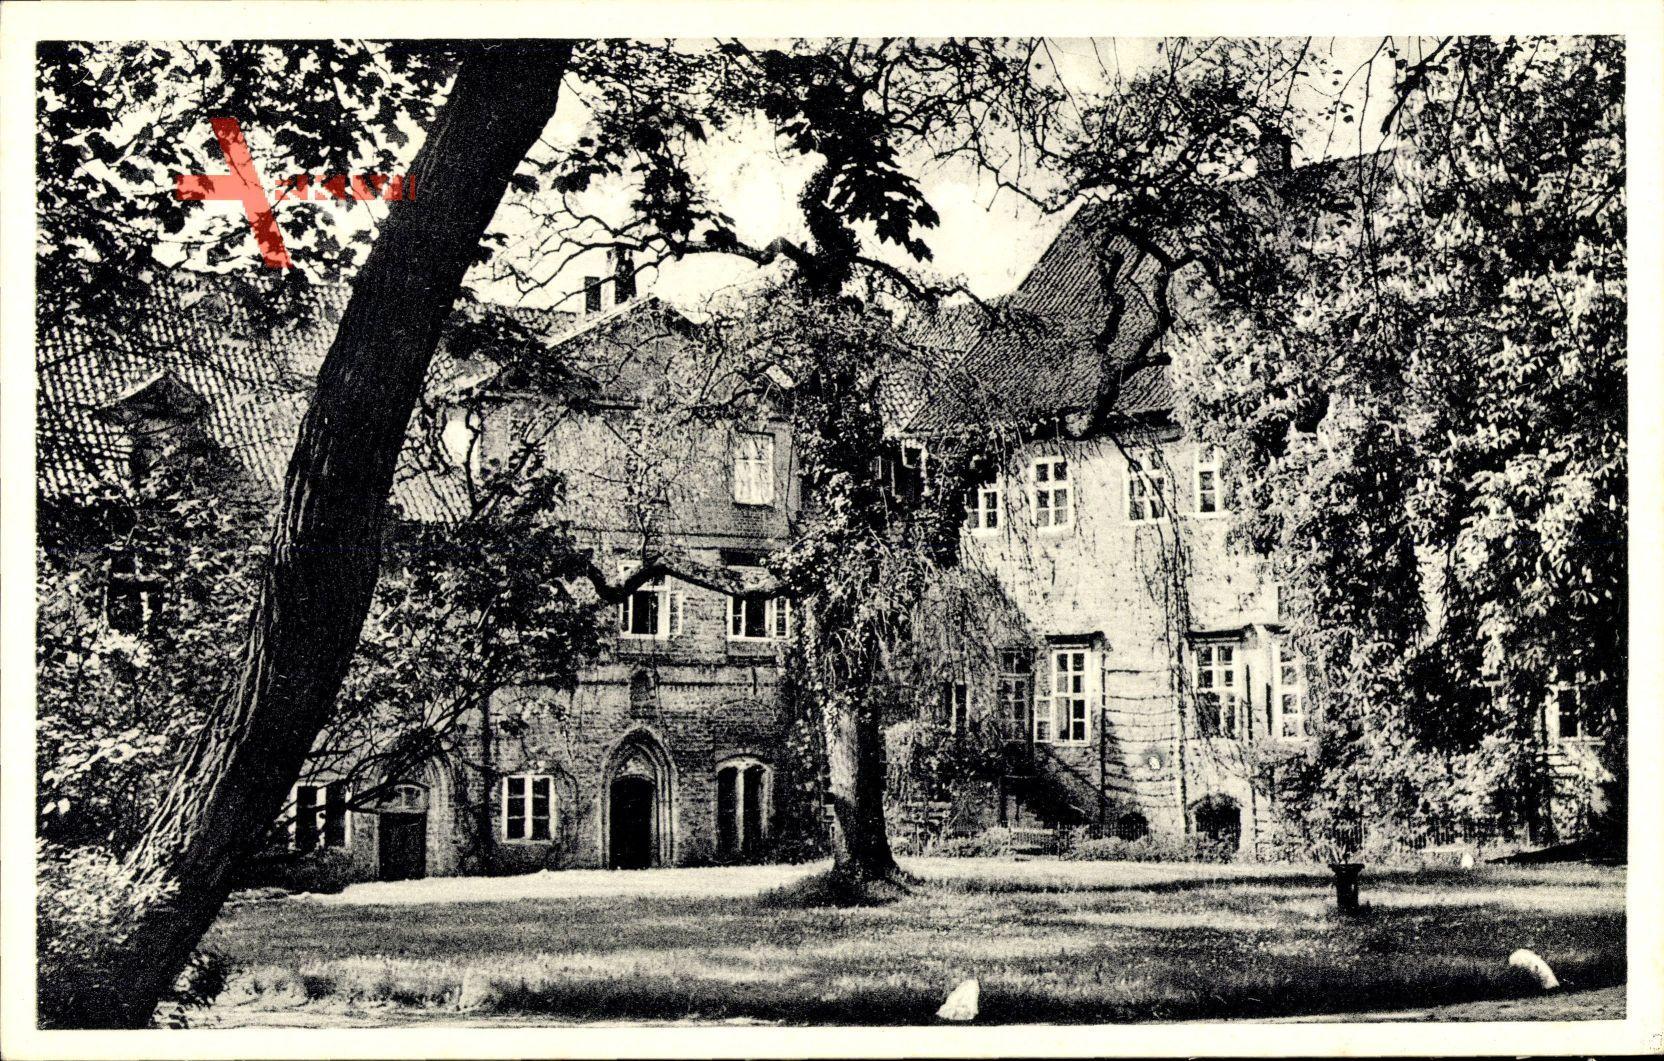 Ebstorf Kr. Uelzen, Blick in den Klosterhof, Frühling